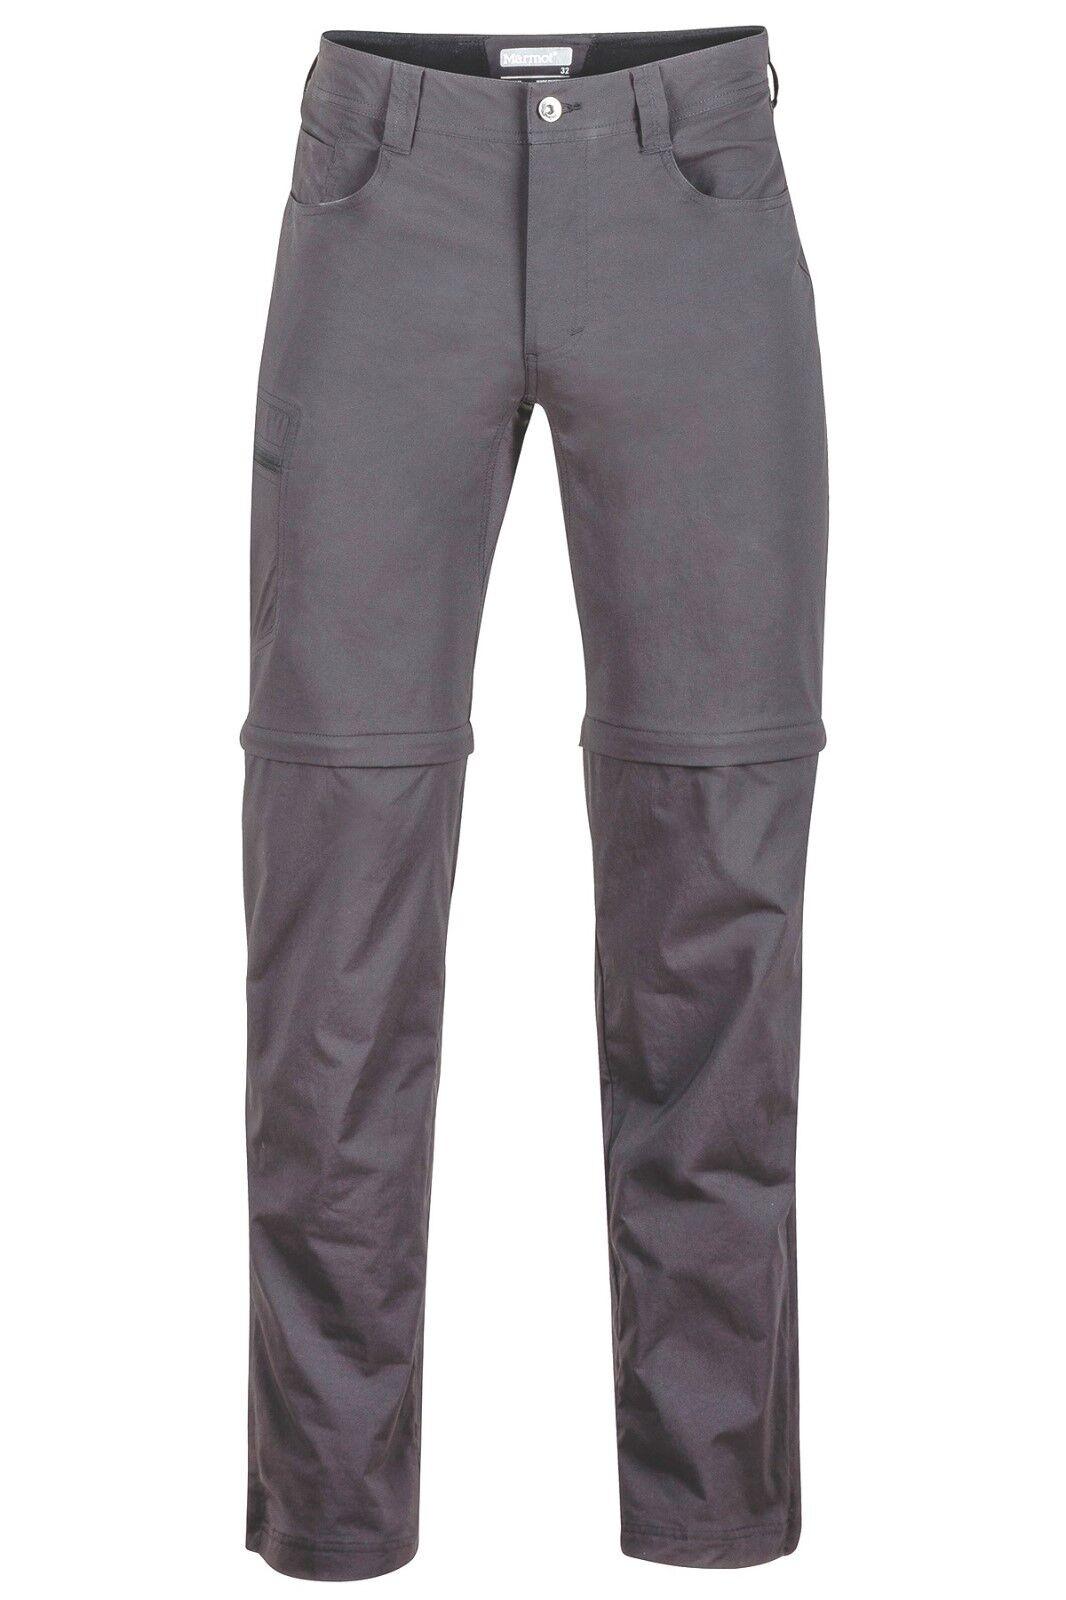 Marmot Transcend ConGrünible Pant Sie, Zip-Off Herrenhose, slate grau